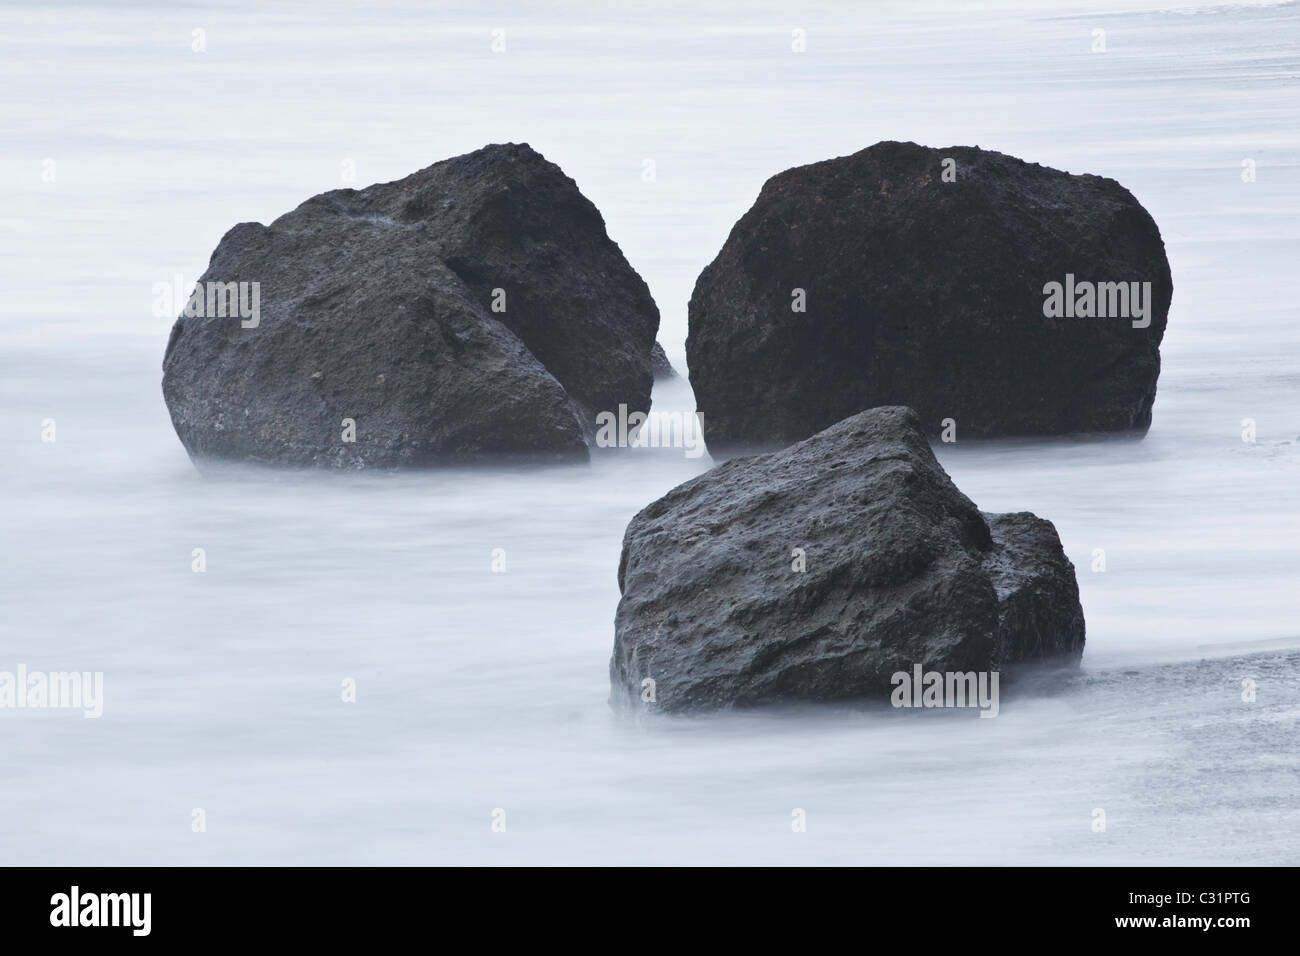 Three large boulders on Ruby Beach, Olympic National Park, Washington. - Stock Image